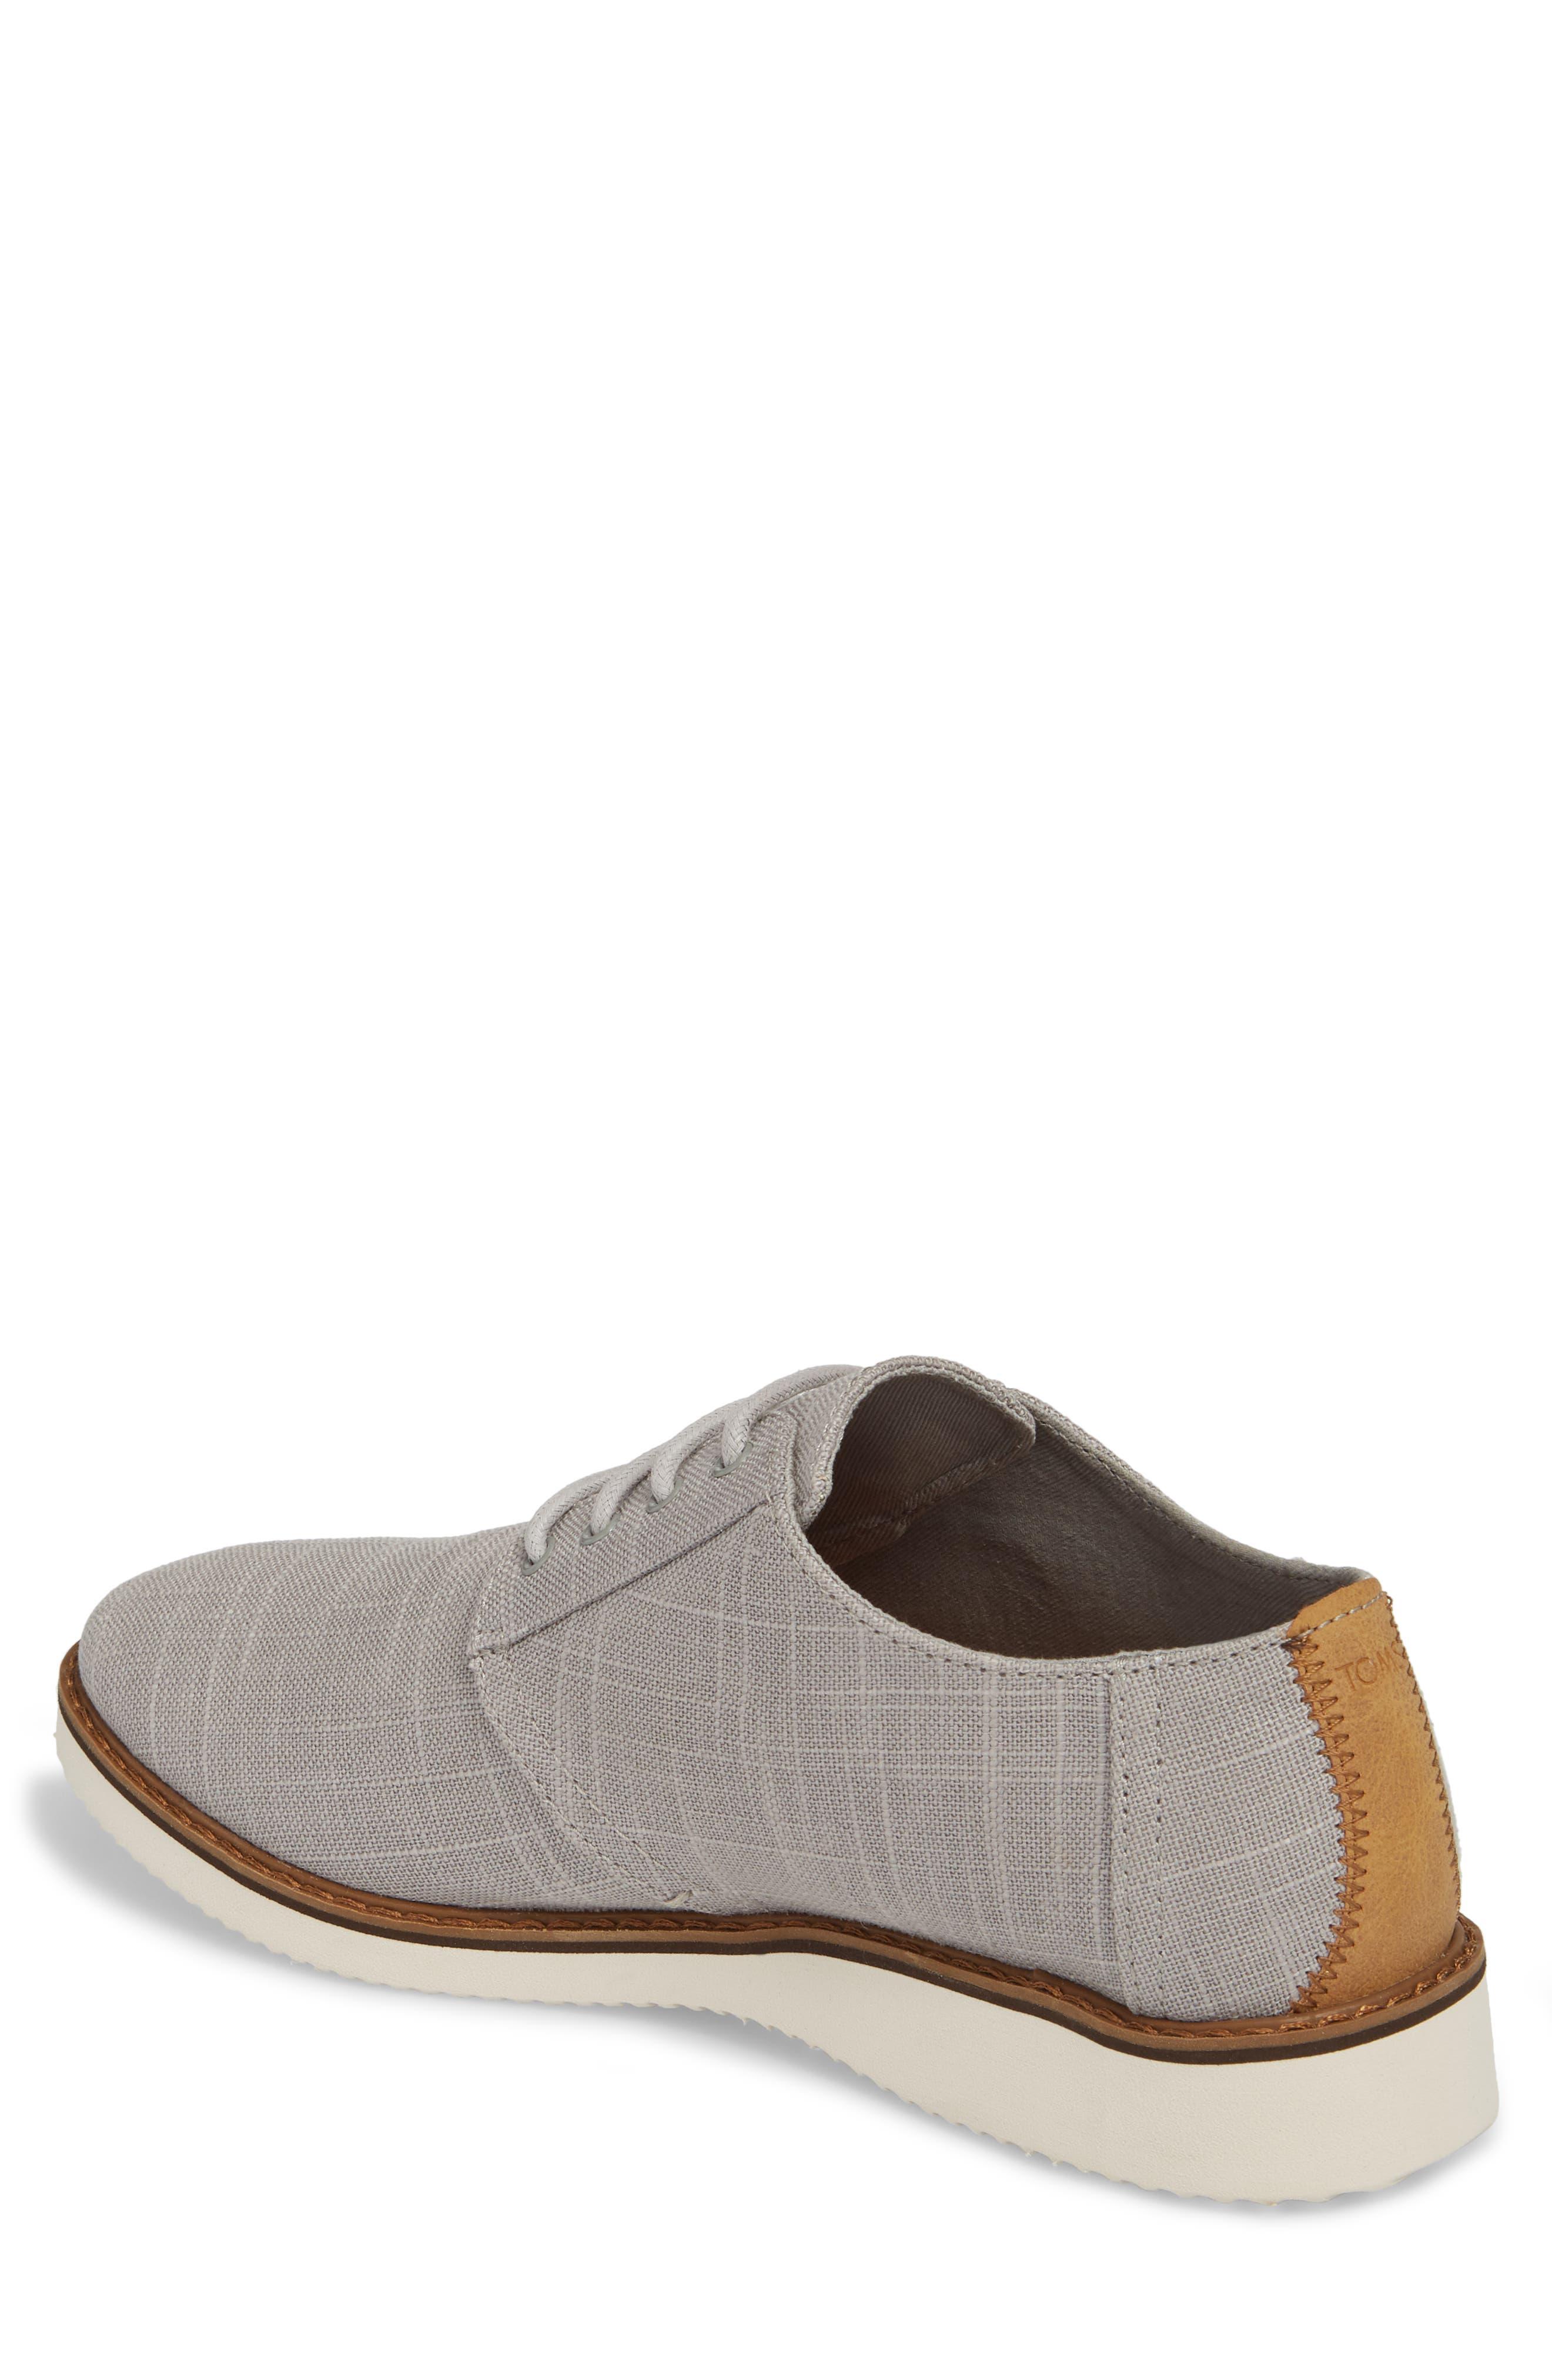 Preston Plain Toe Derby,                             Alternate thumbnail 2, color,                             Grey Linen